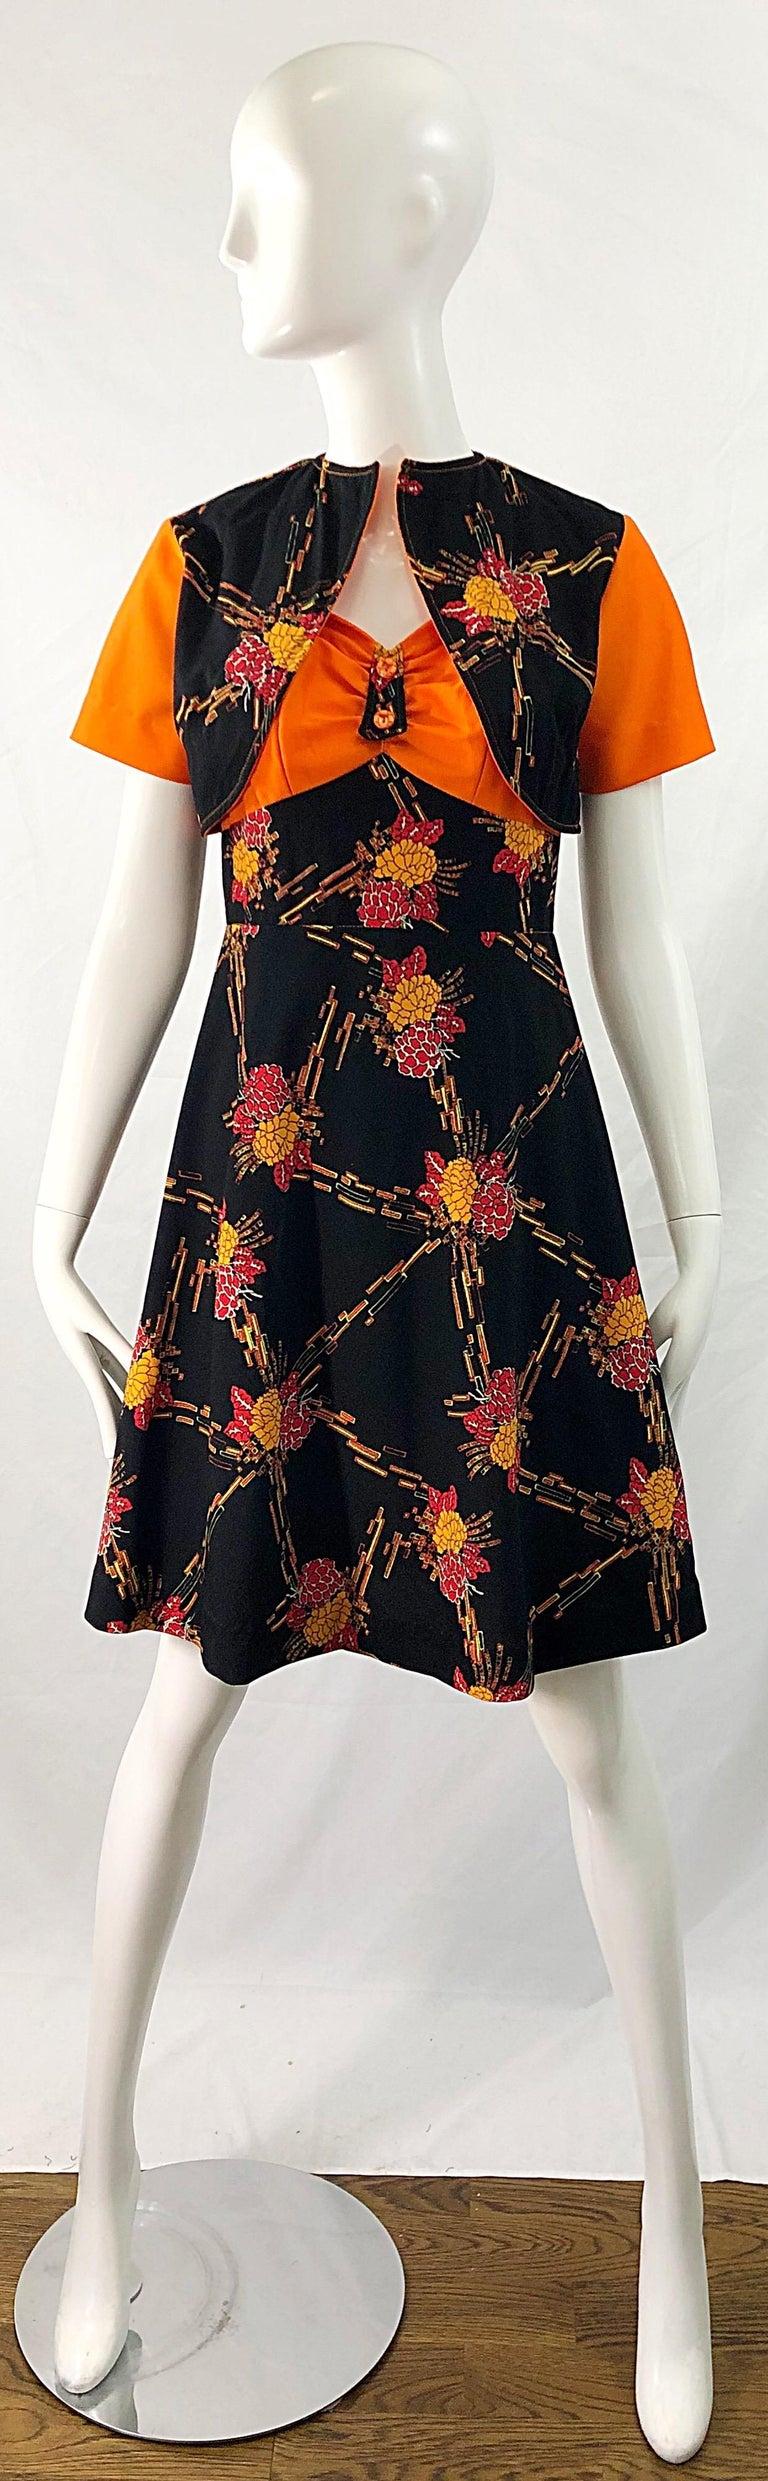 1970s Autumnal Digital Floral Print Knit Vintage 70s A Line Dress + Bolero Top For Sale 13